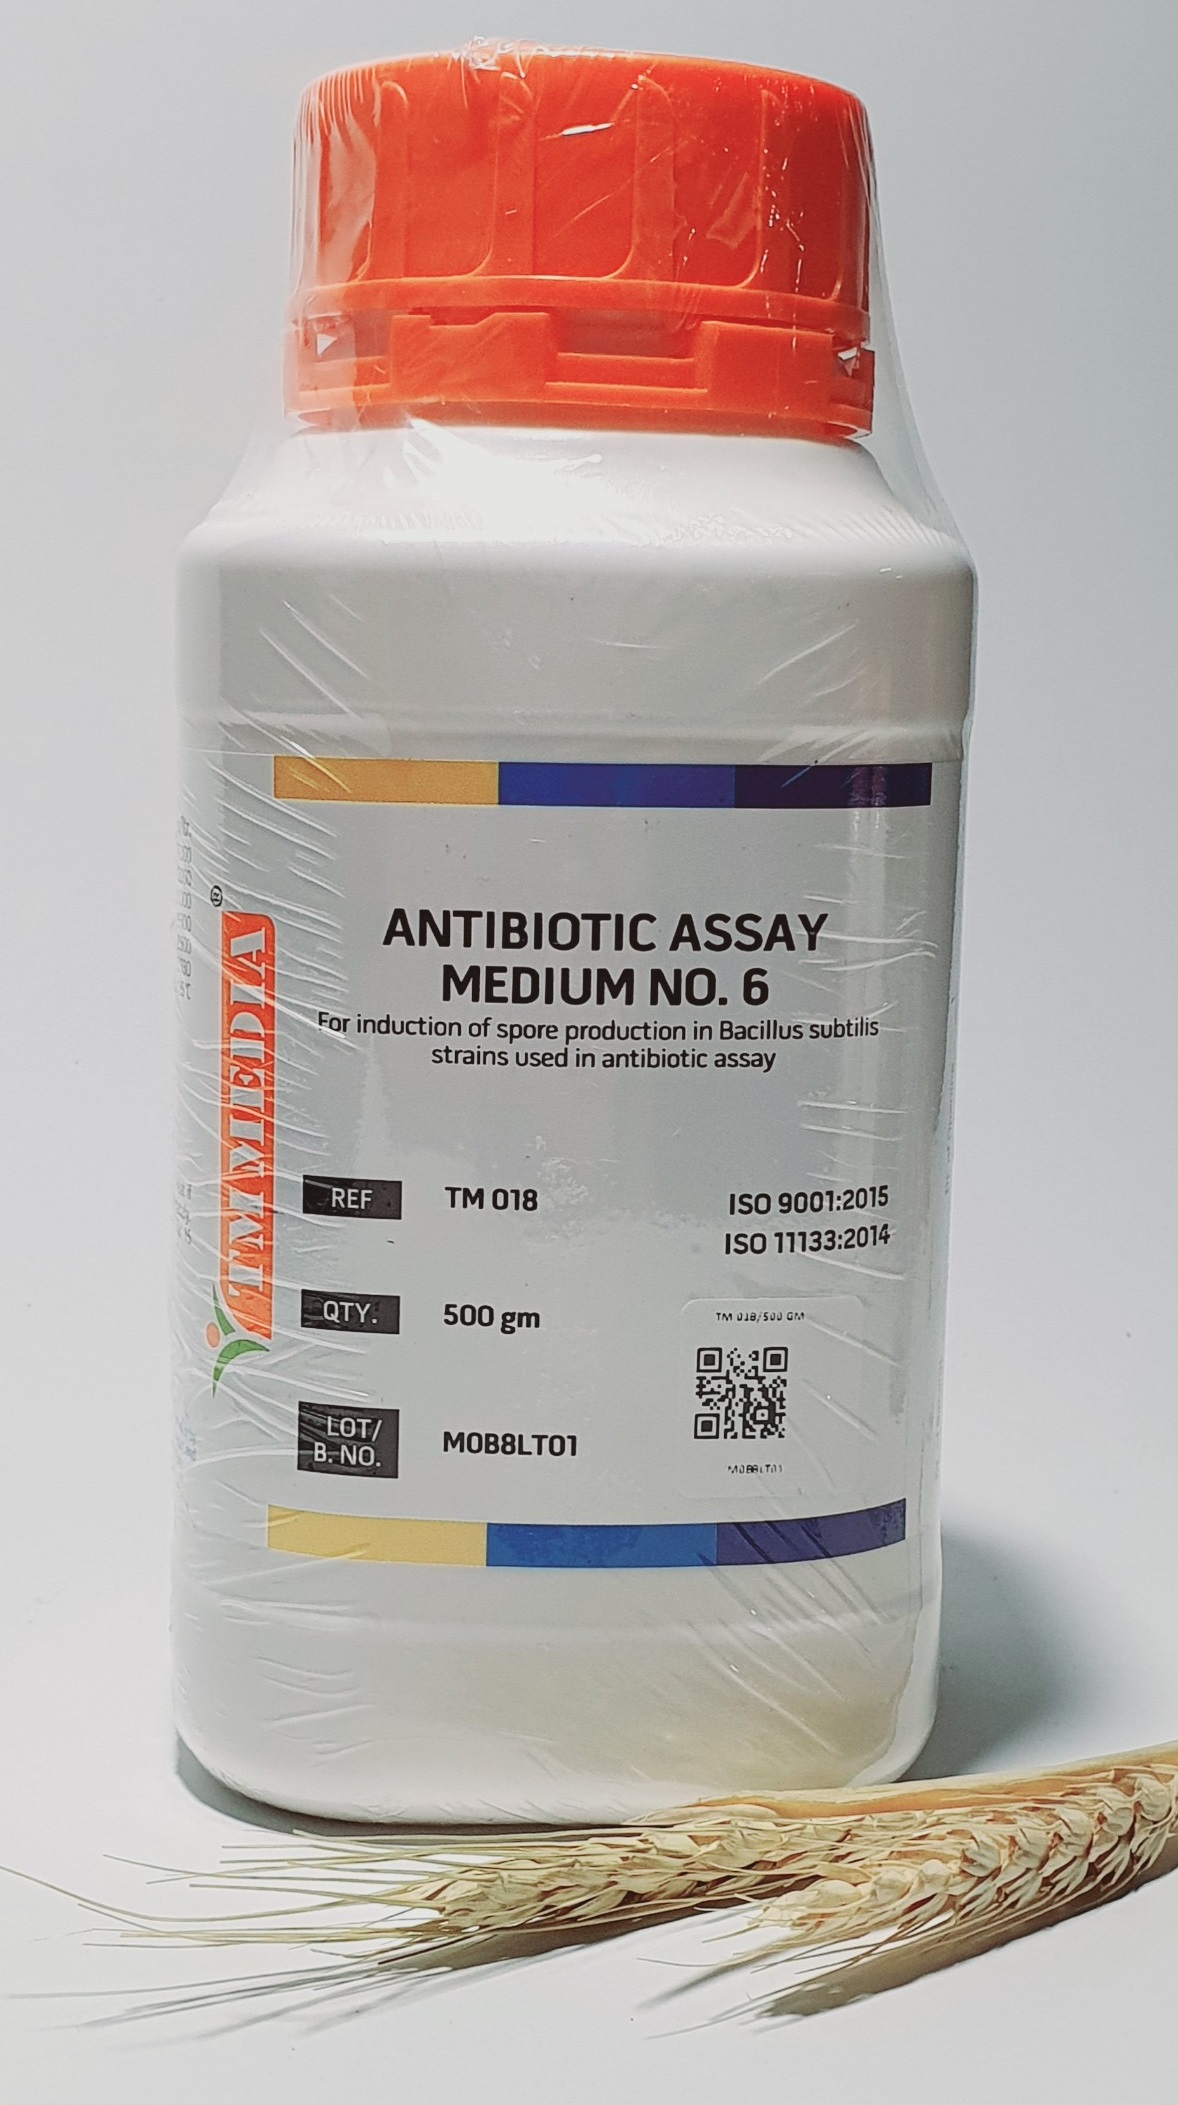 Antibiotic Assay Medium No. 6